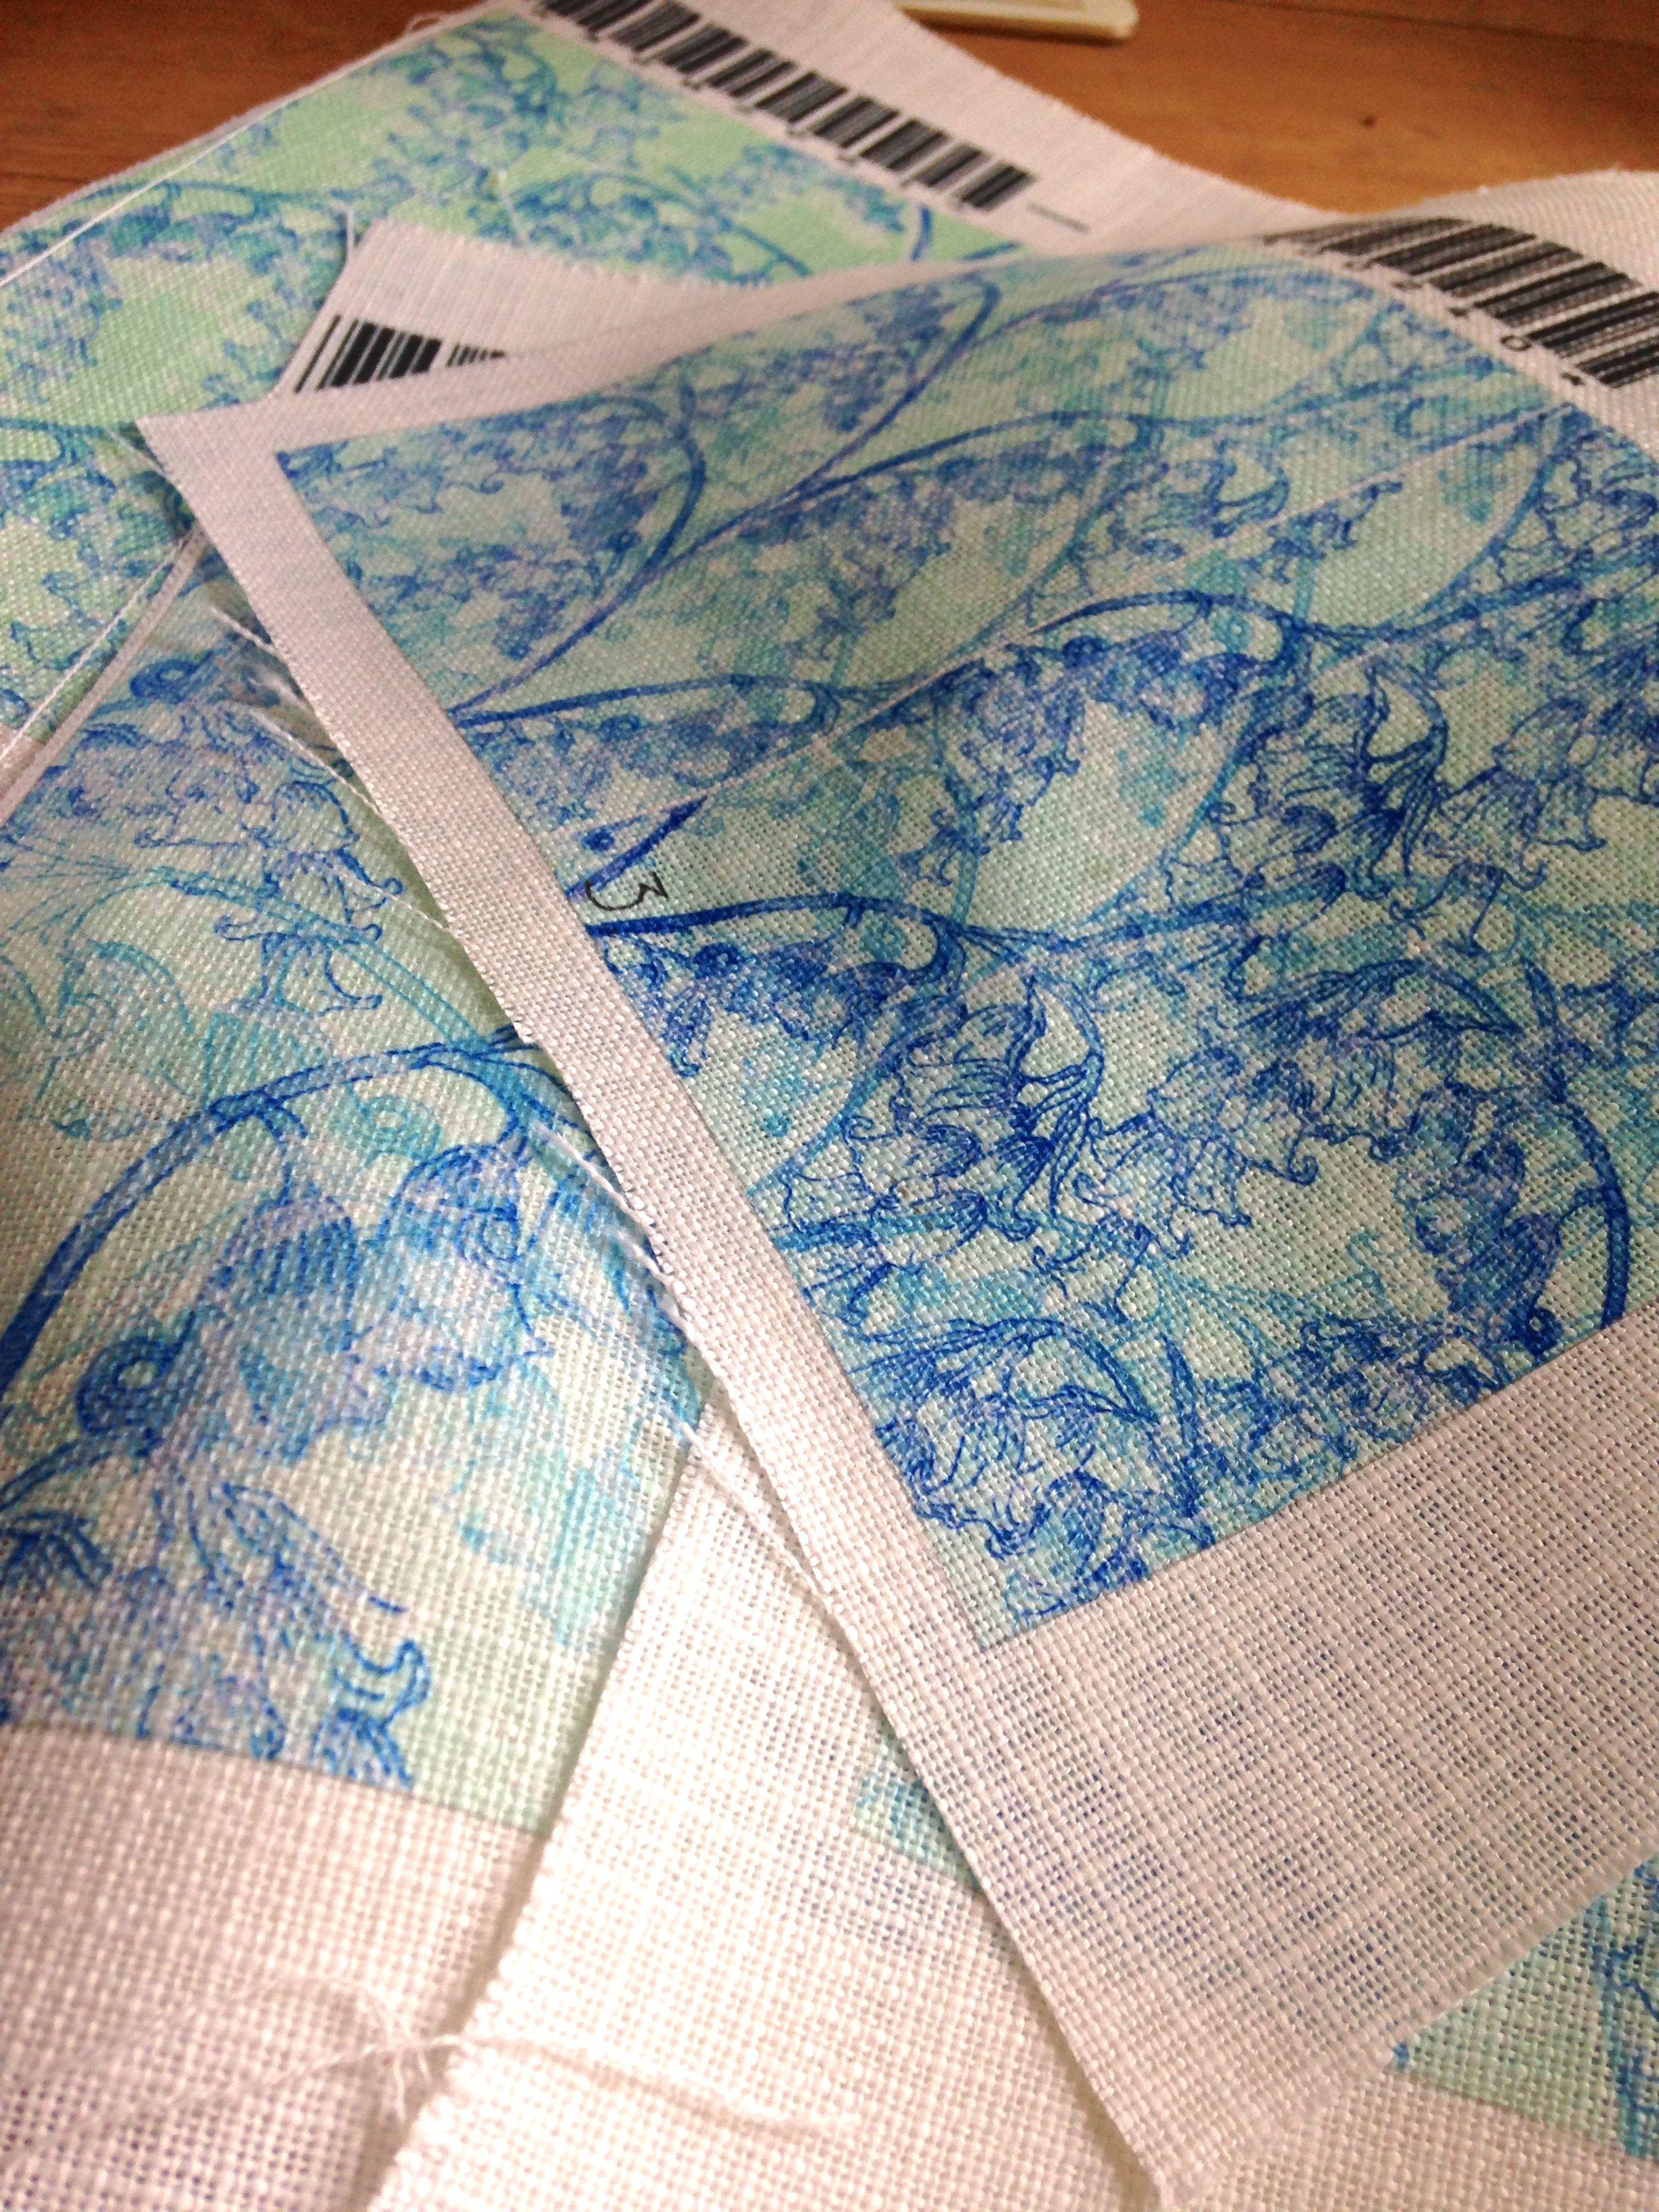 More beautiful samples printed by @bagsofloveuk